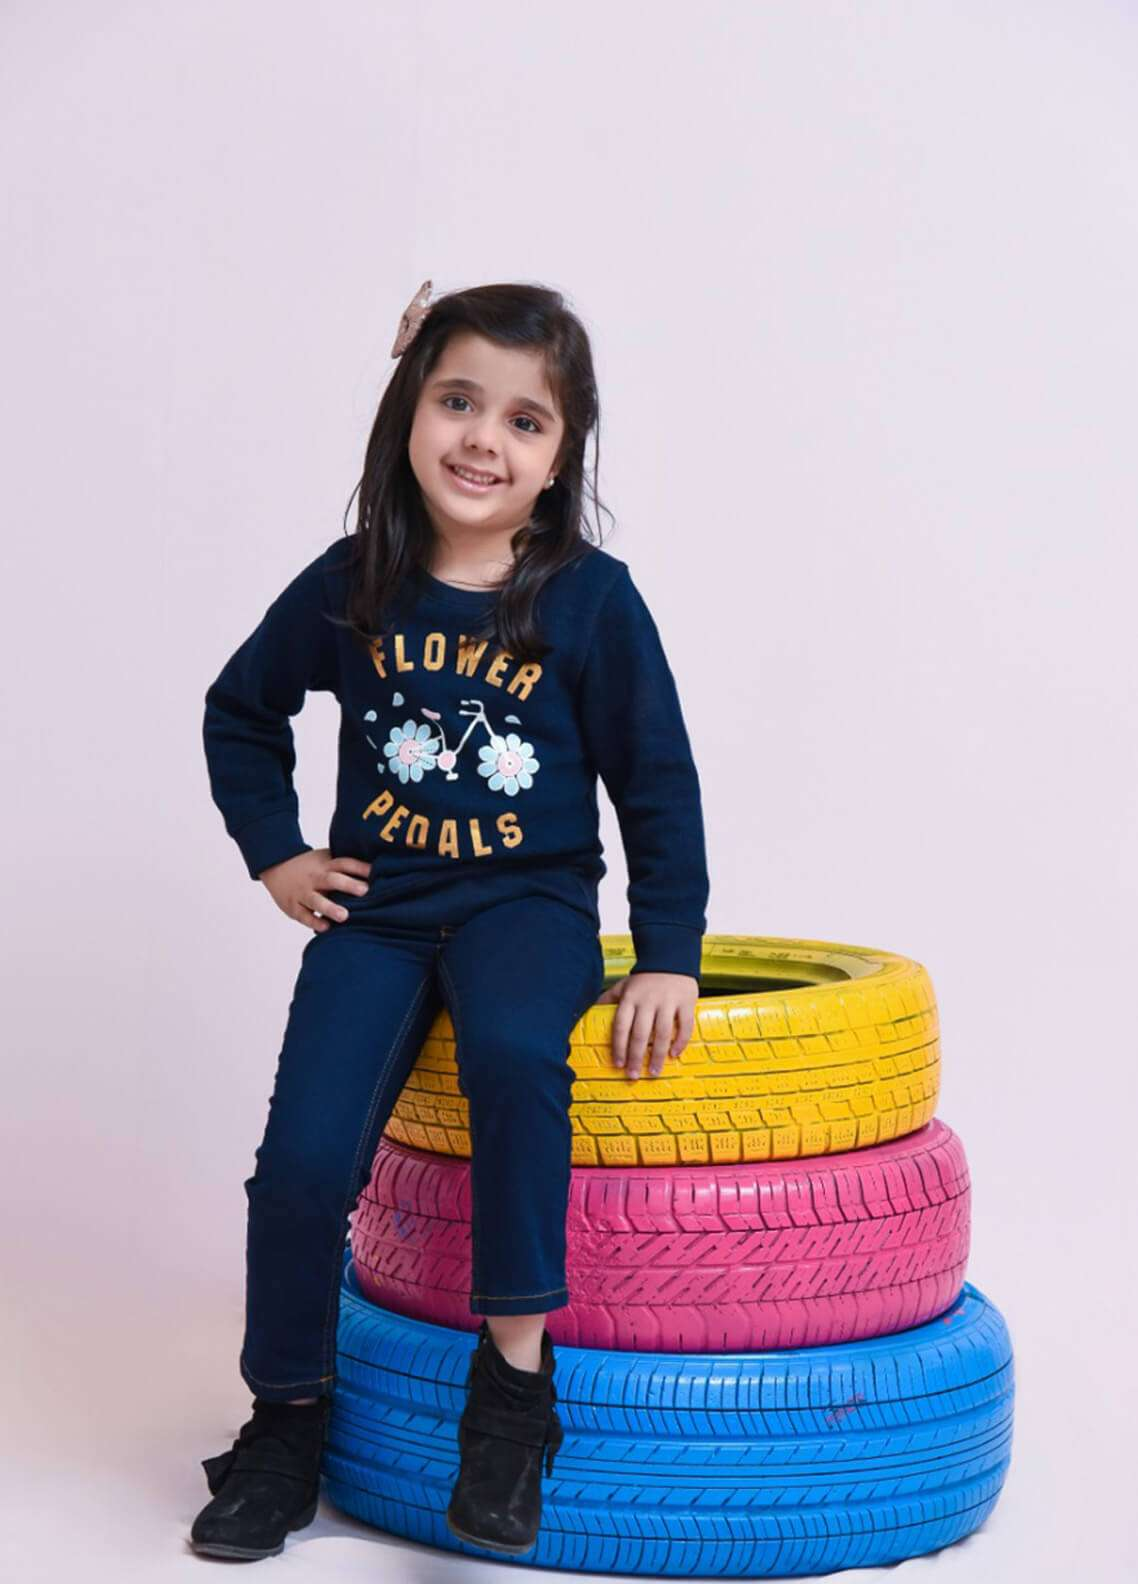 Ochre Cotton Textured Sweatshirt for Girls - Navy Blue OFT 01